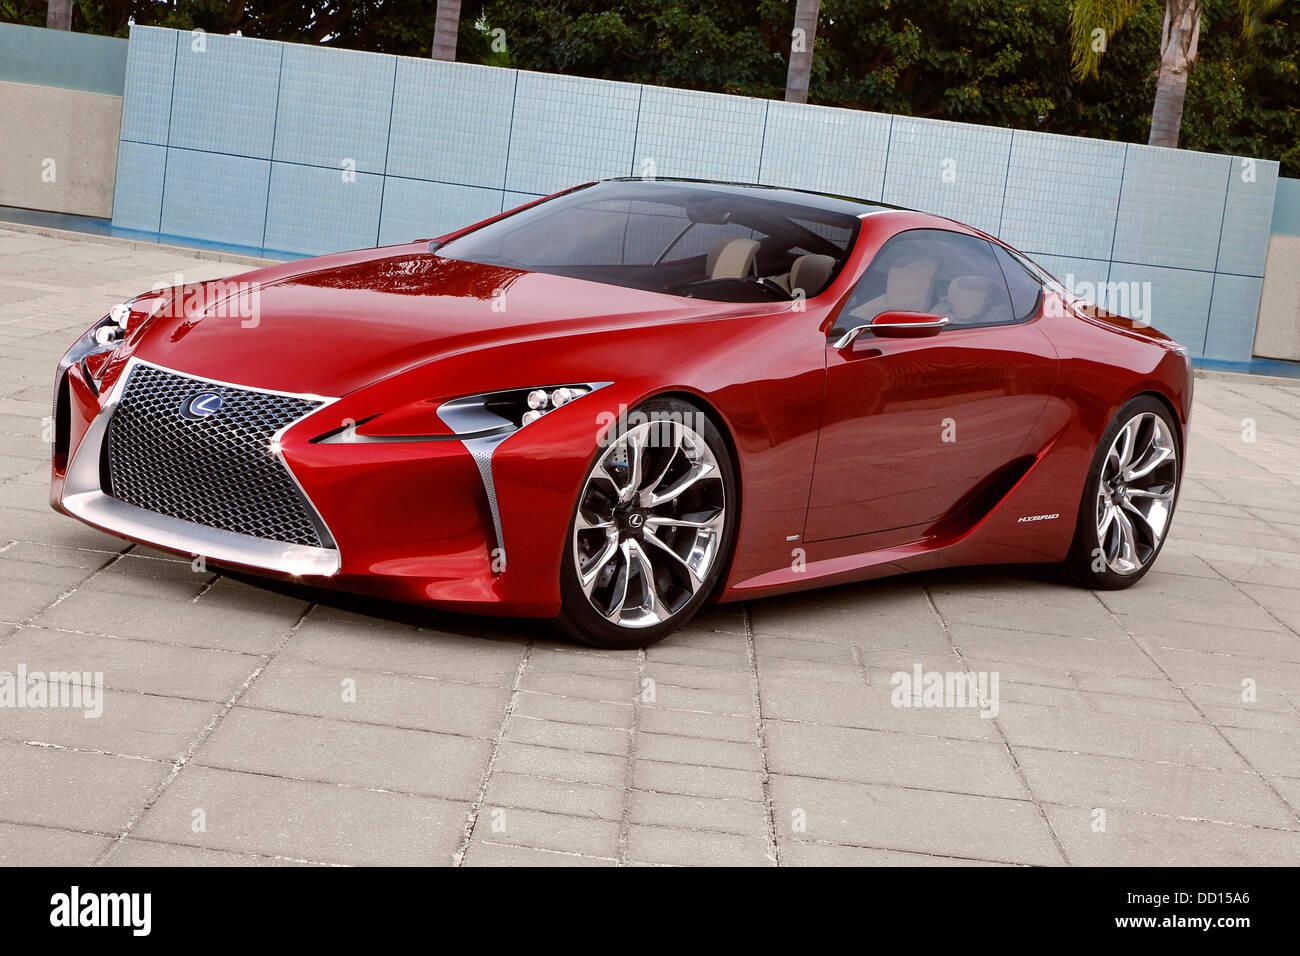 Lexus Two Door >> Lexus LF-LC 2+2 Hybrid Concept Unveiled Lexus unveiled its